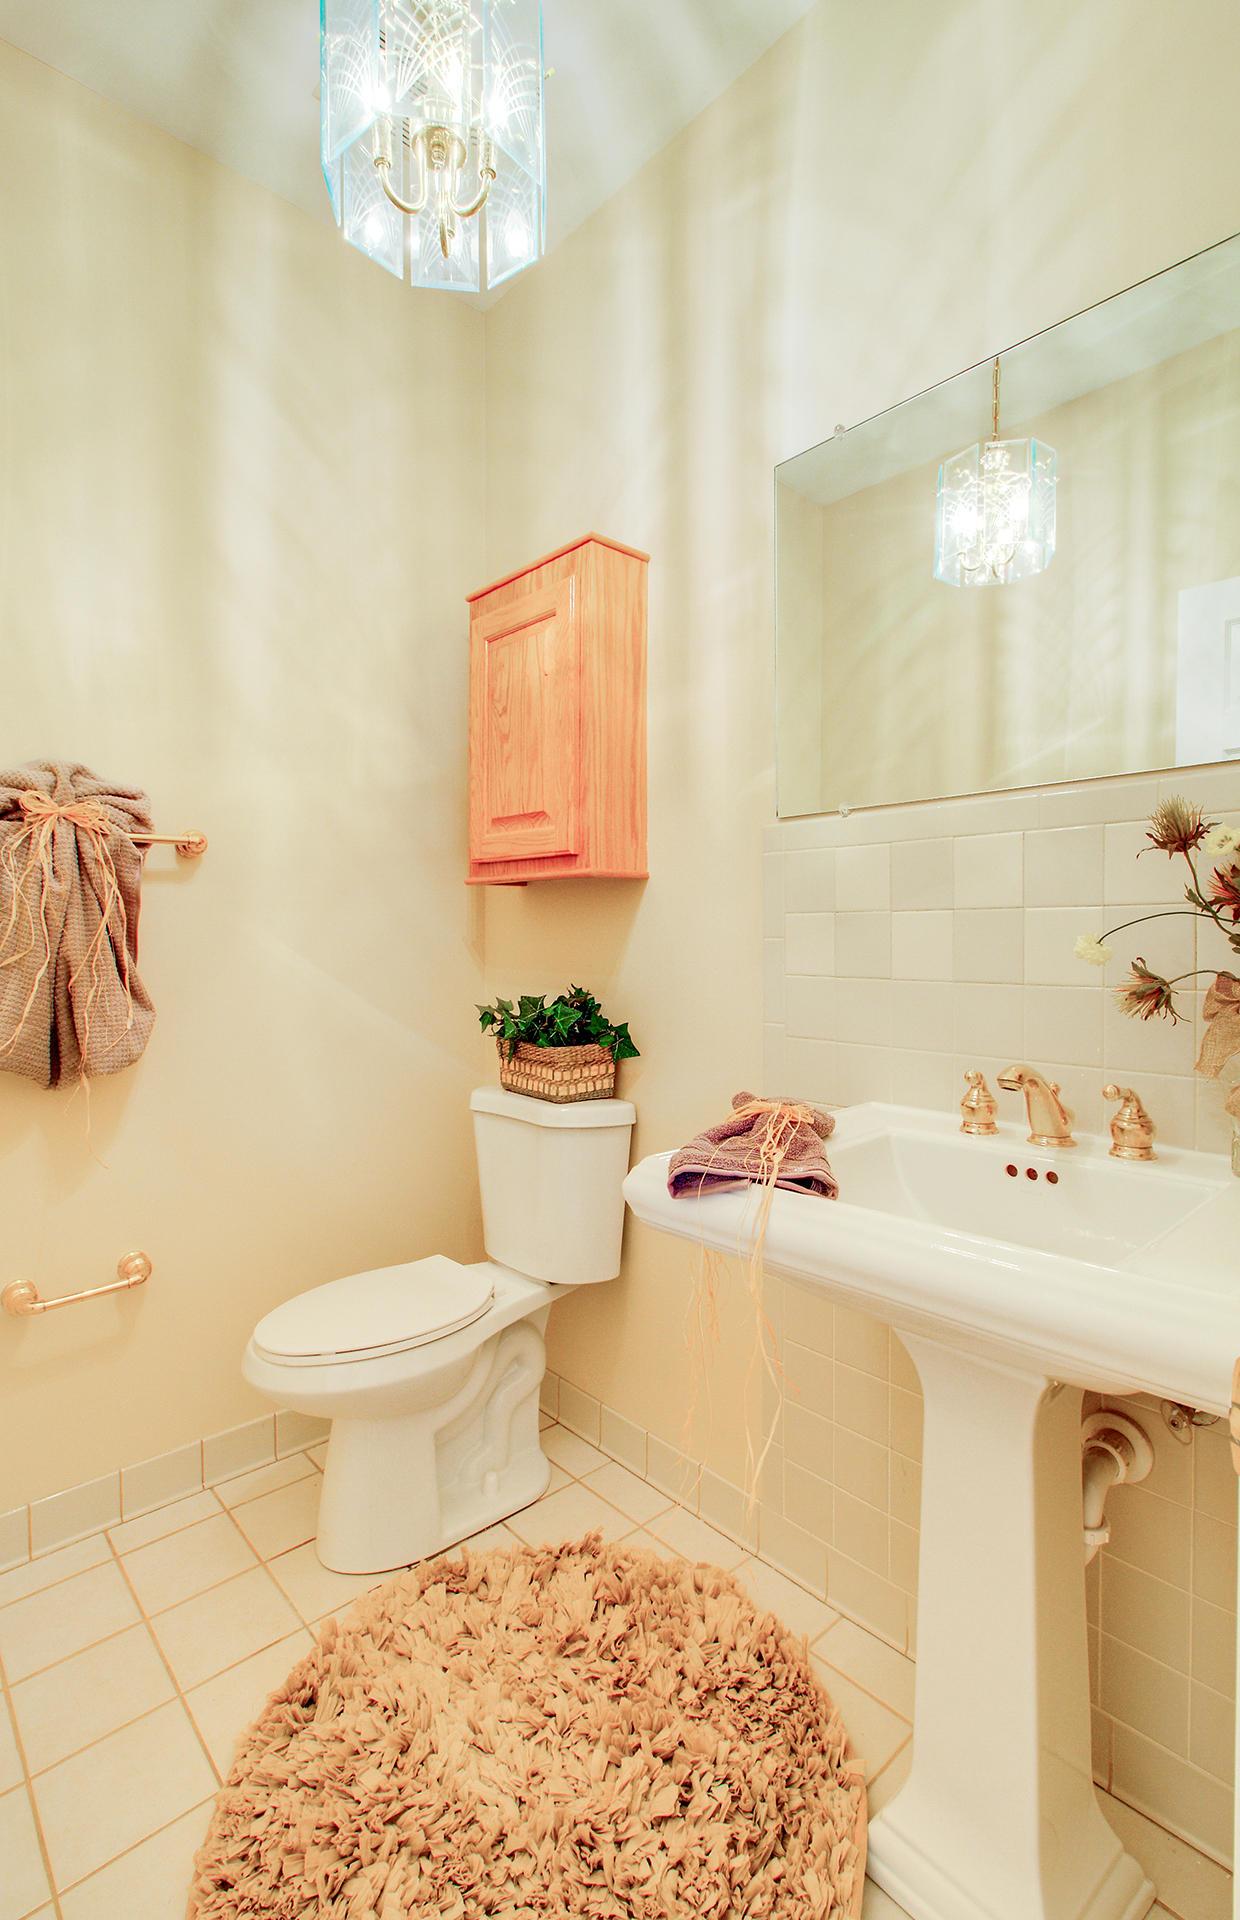 Bakers Landing Homes For Sale - 105 River Oak, North Charleston, SC - 21